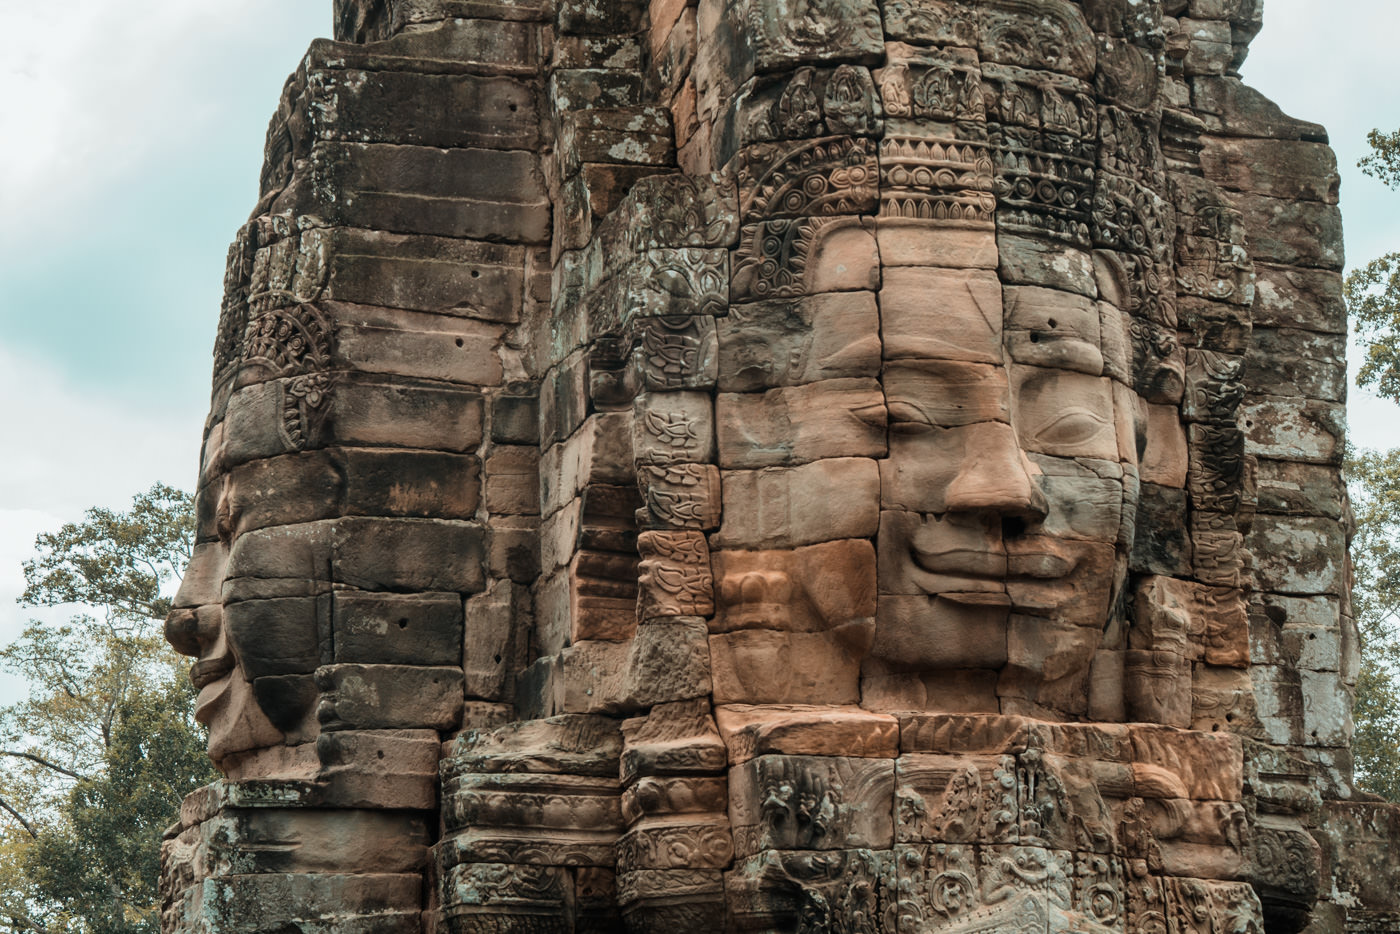 Angkor Thom, Tempel der Gesichter, Kambodscha